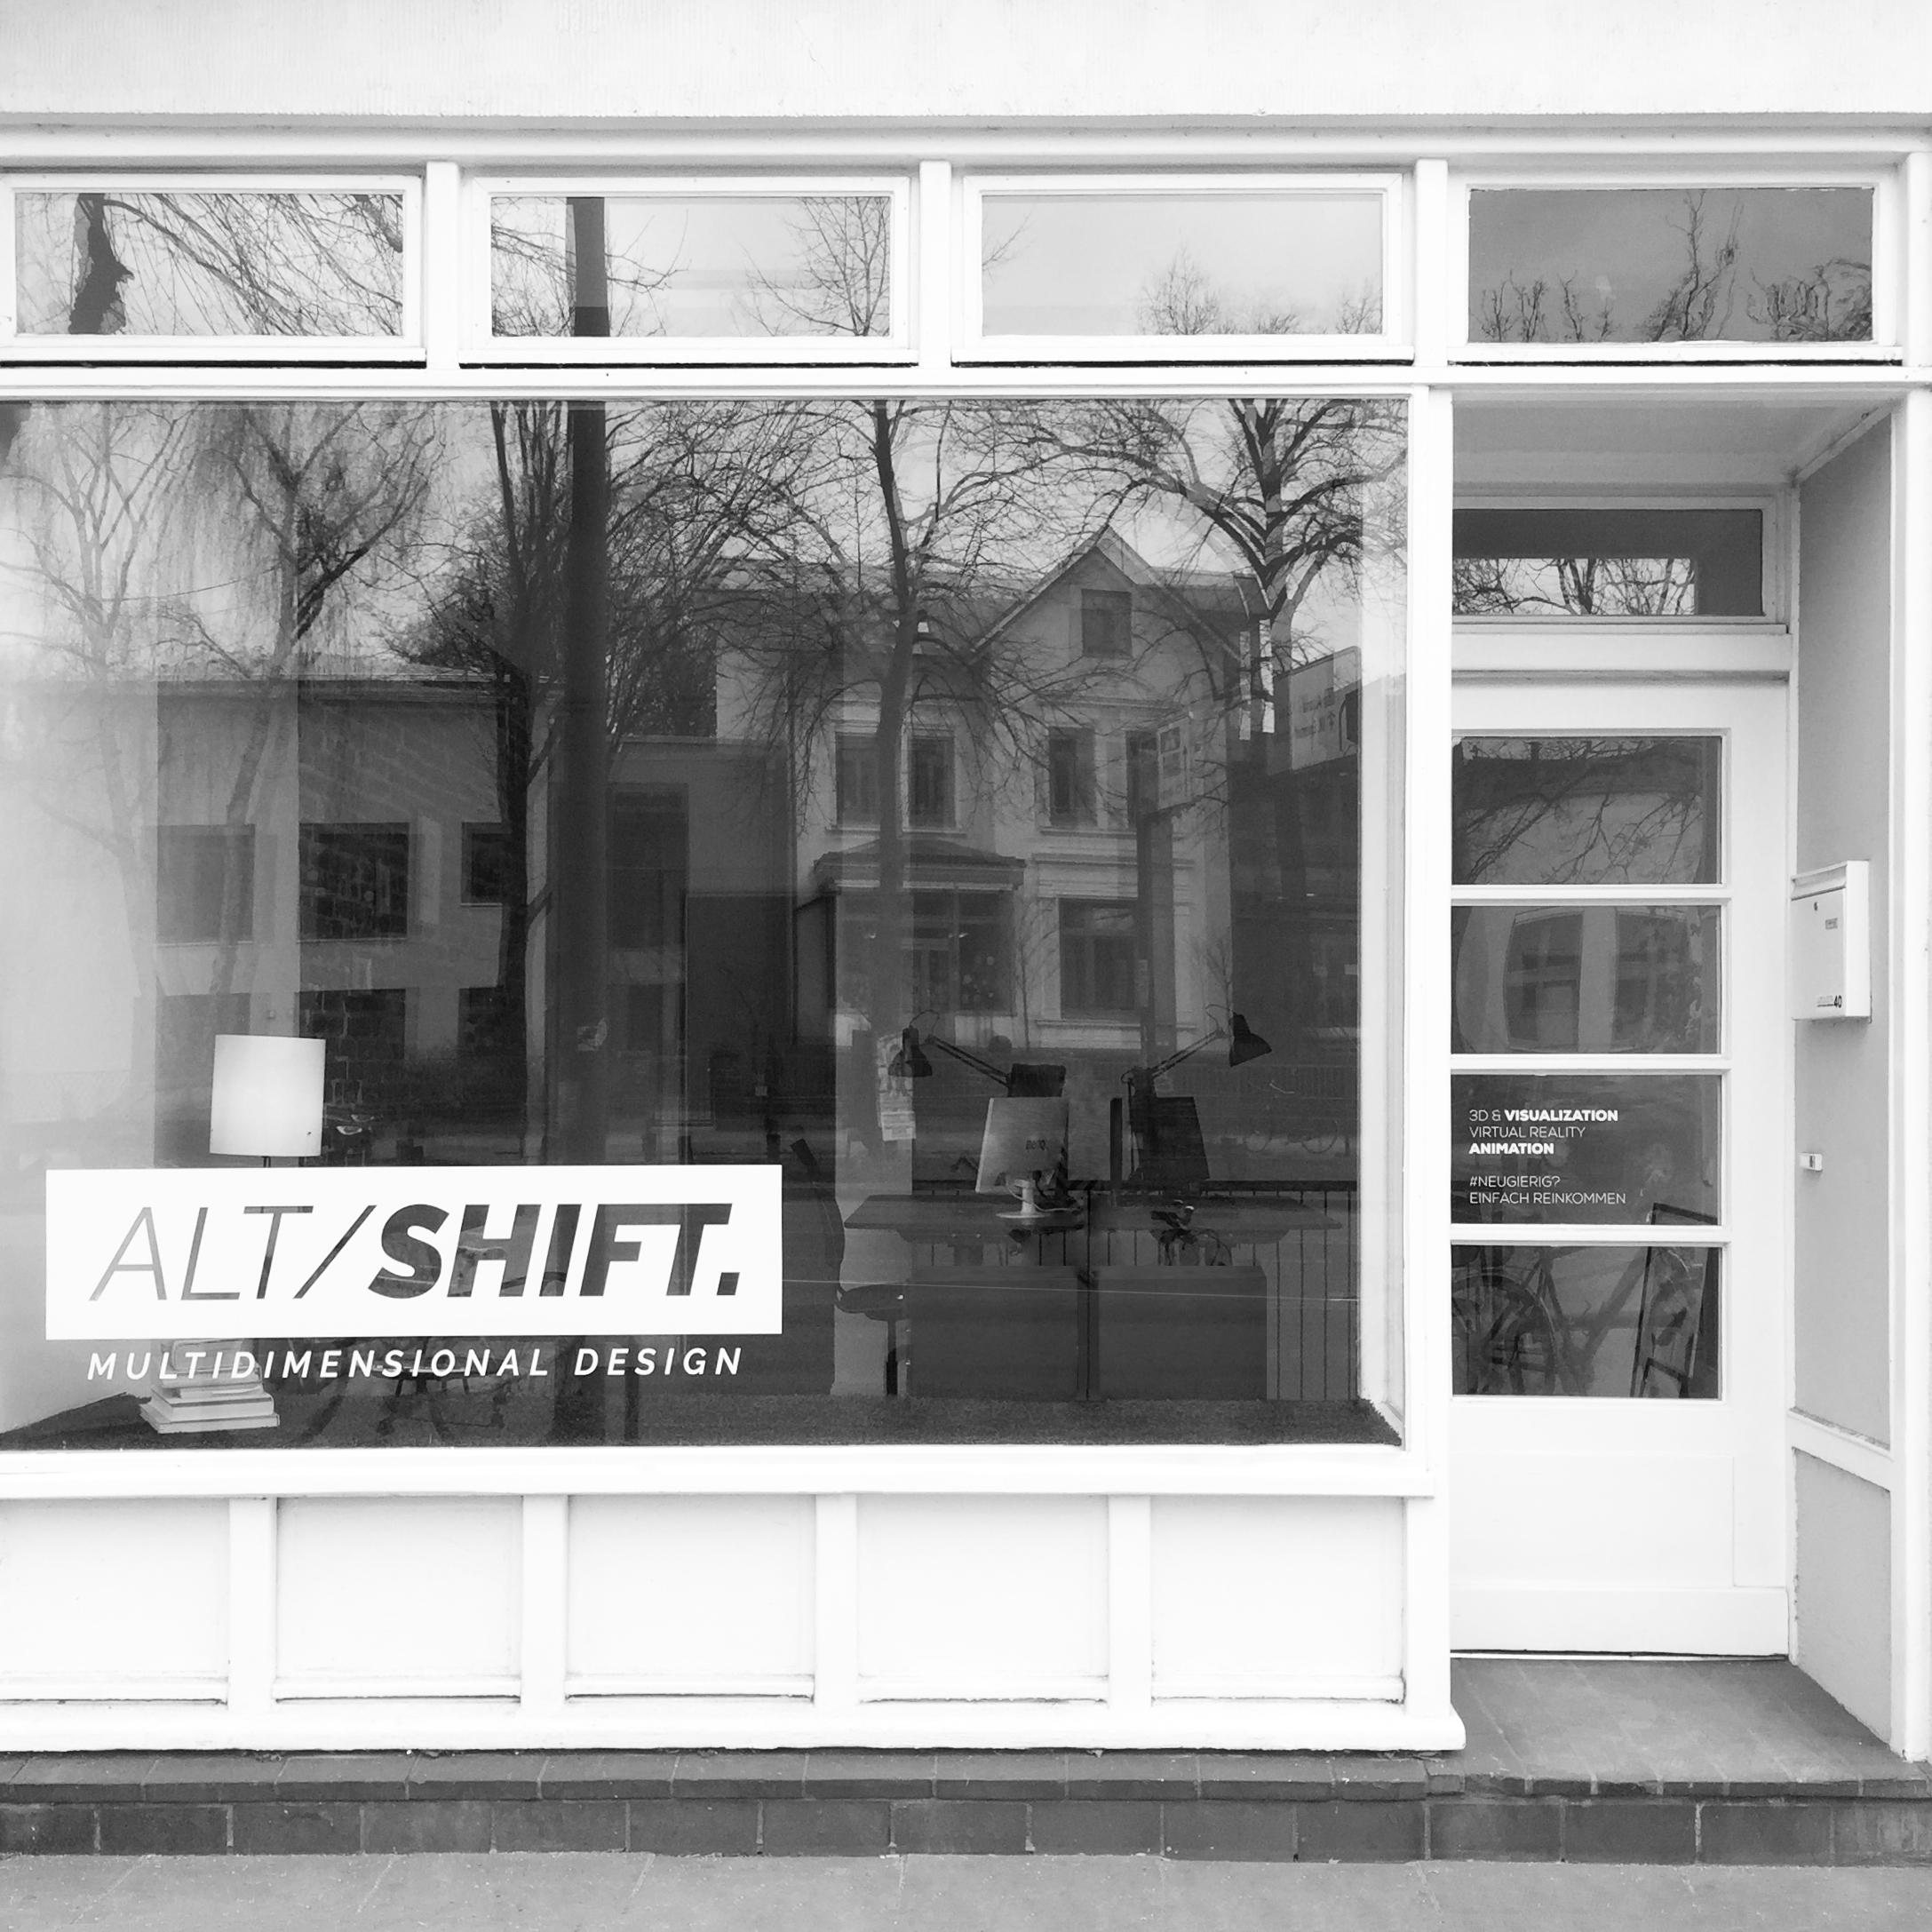 ALTSHIFT__Studio_02.jpg